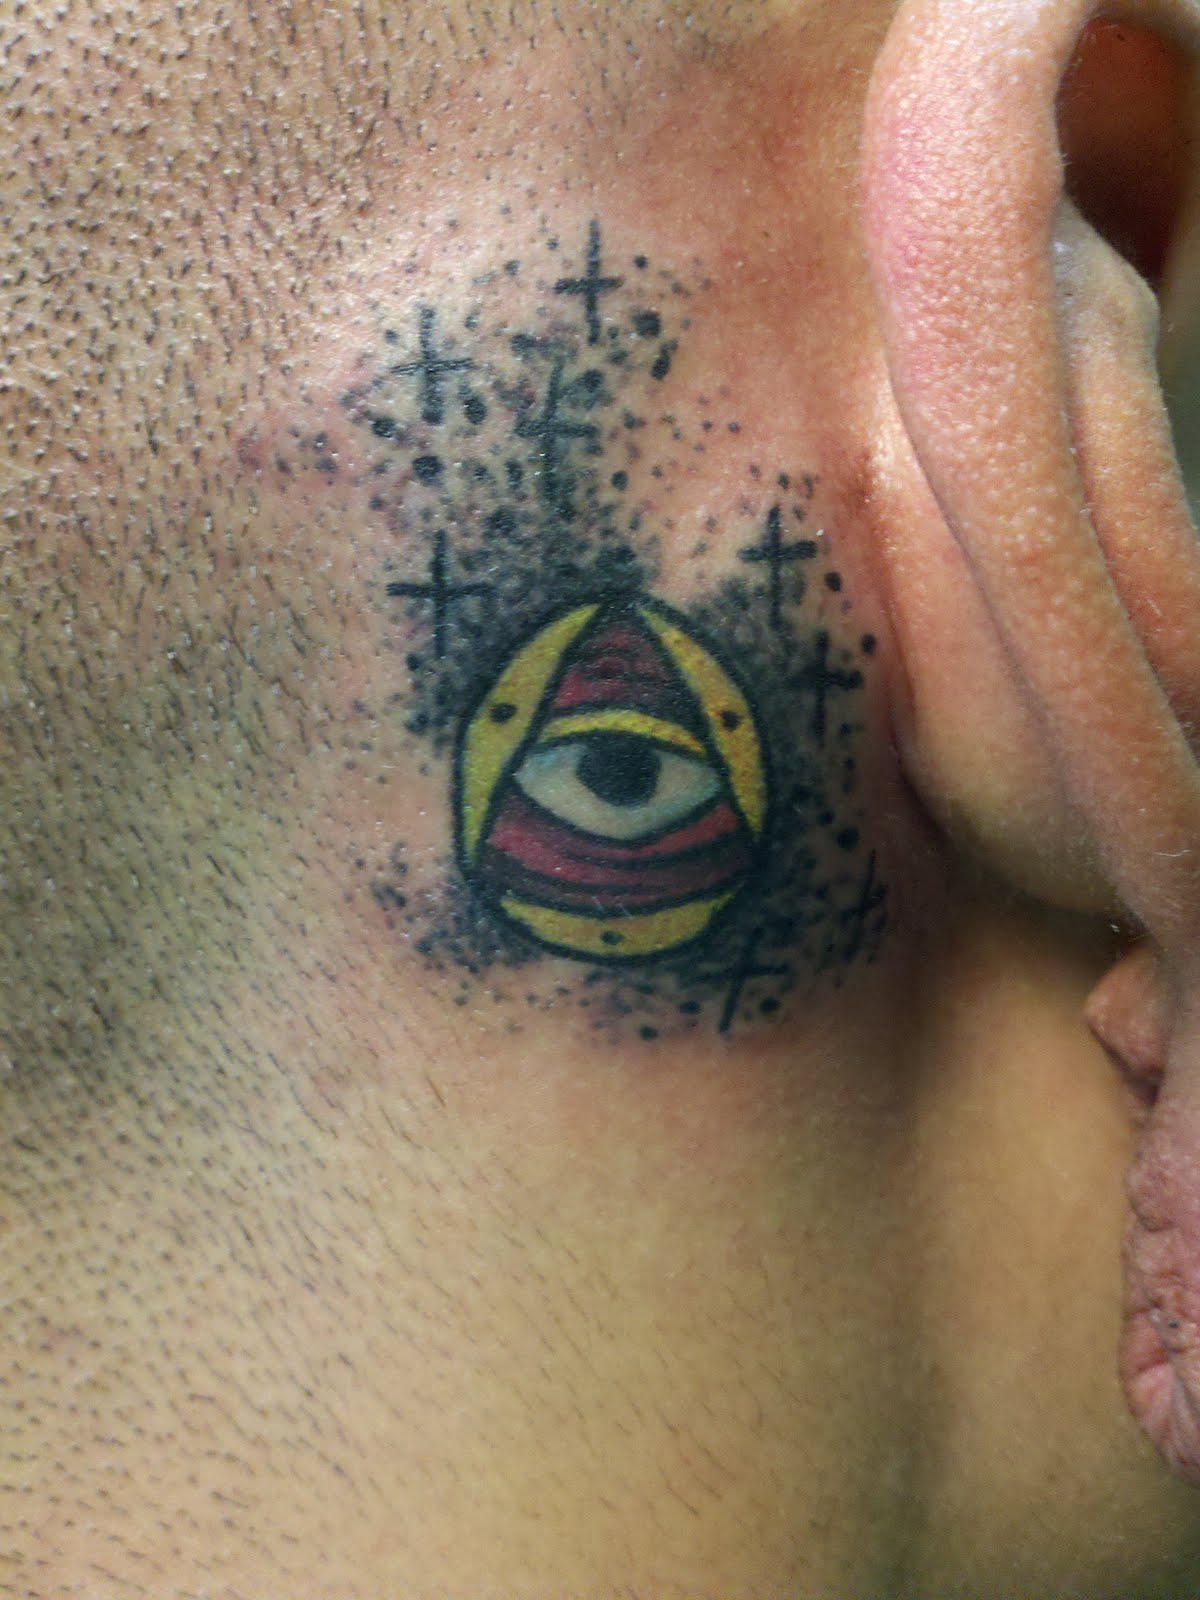 Color illuminati eye tattoo behind ear izmirmasajfo